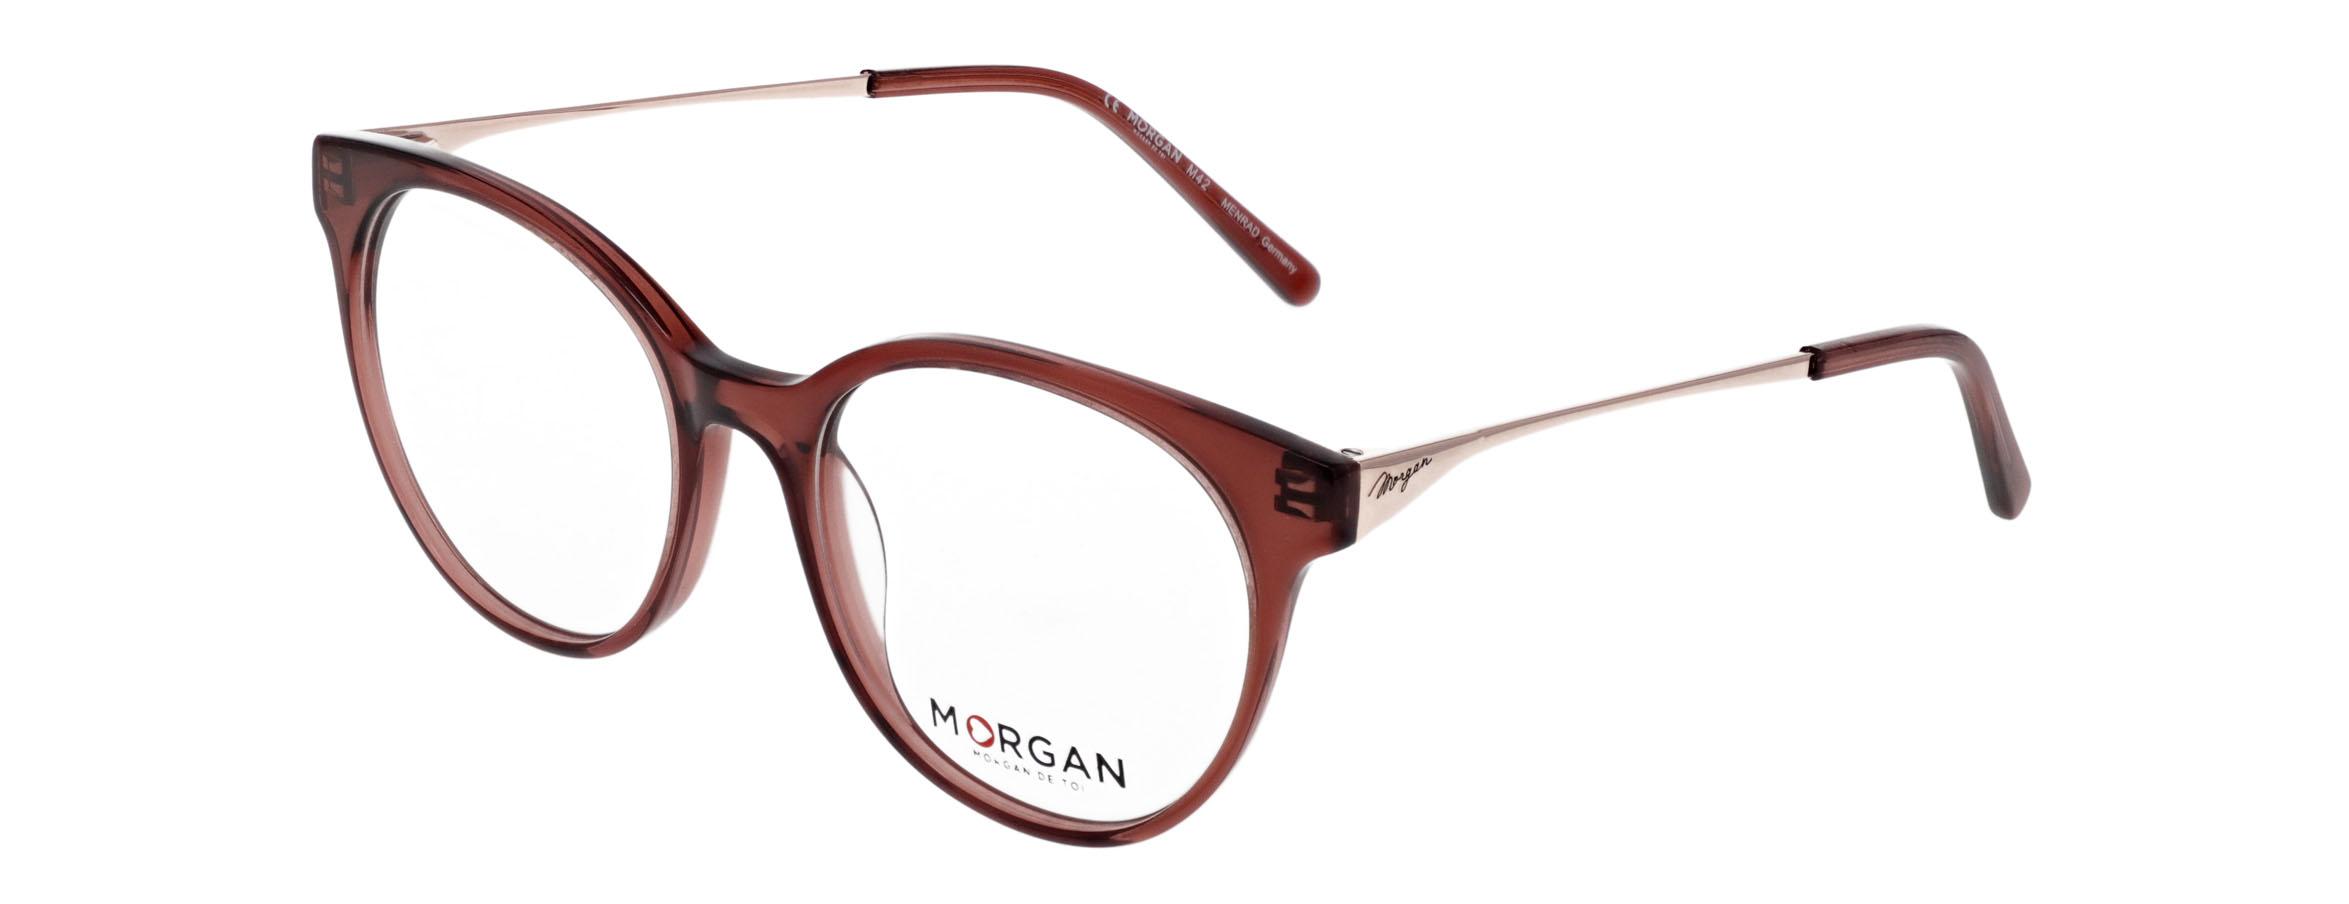 Morgan 202026 3500